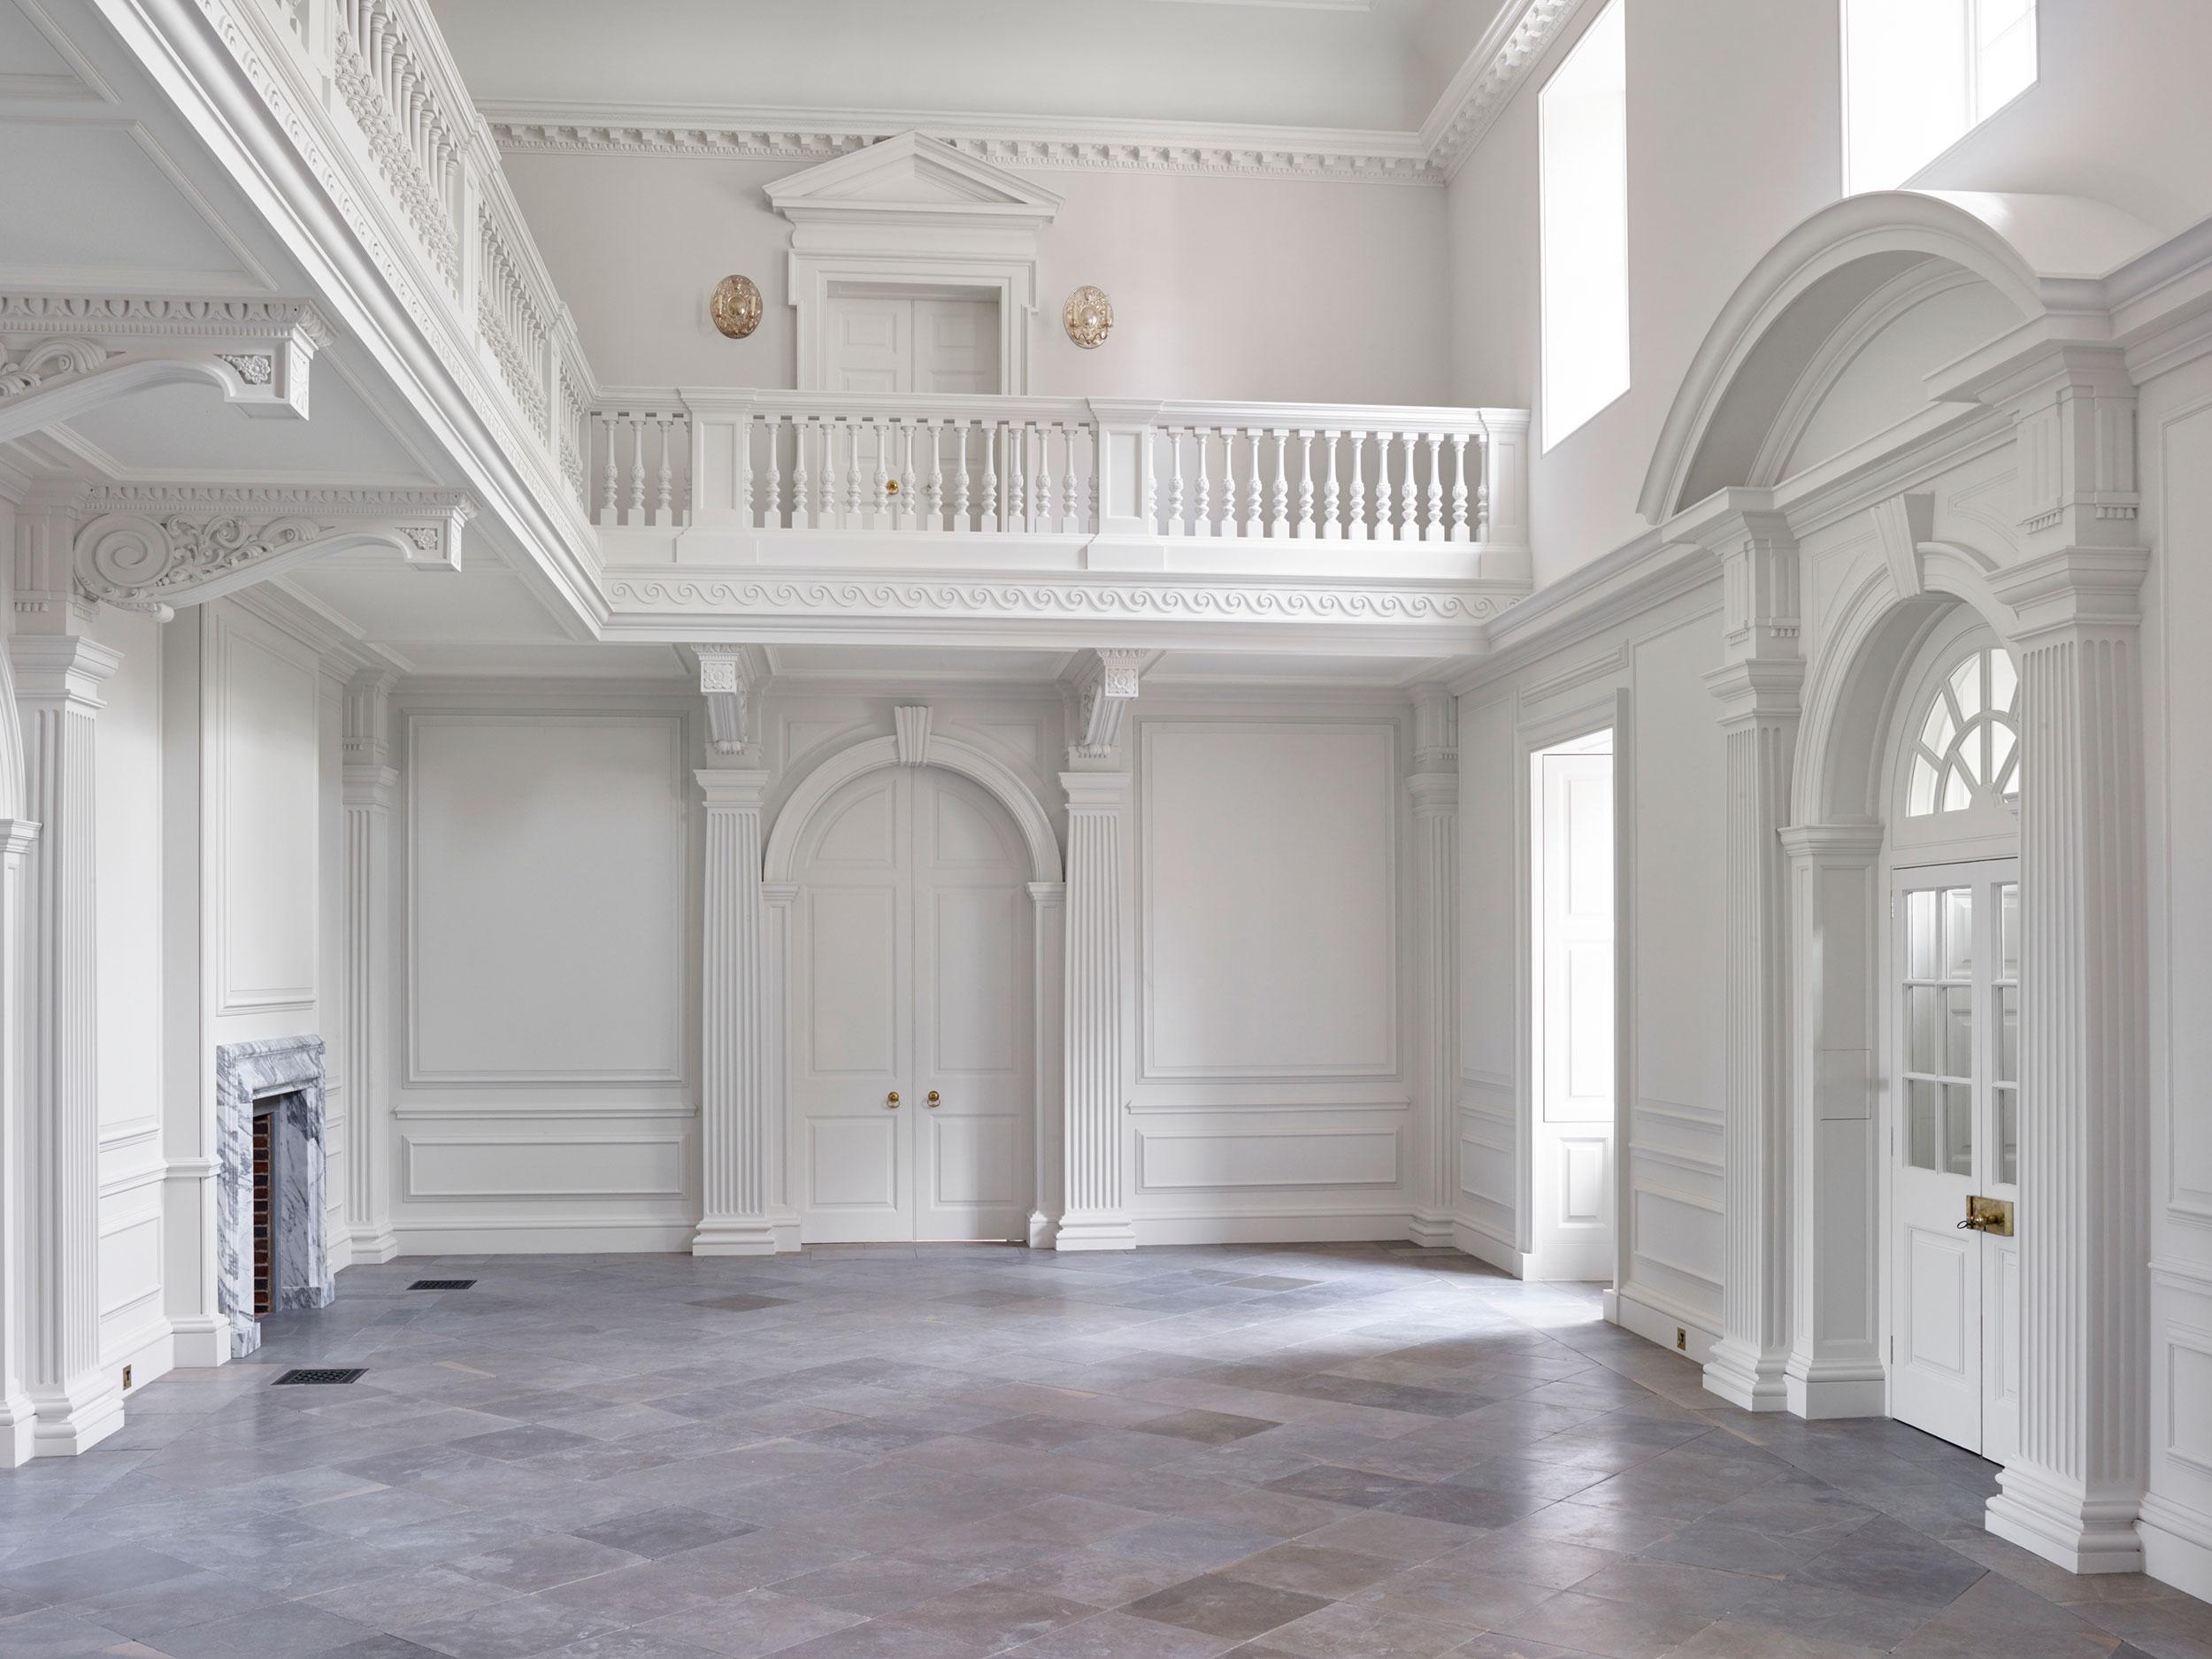 Interiors Ben Pentreath Ltd